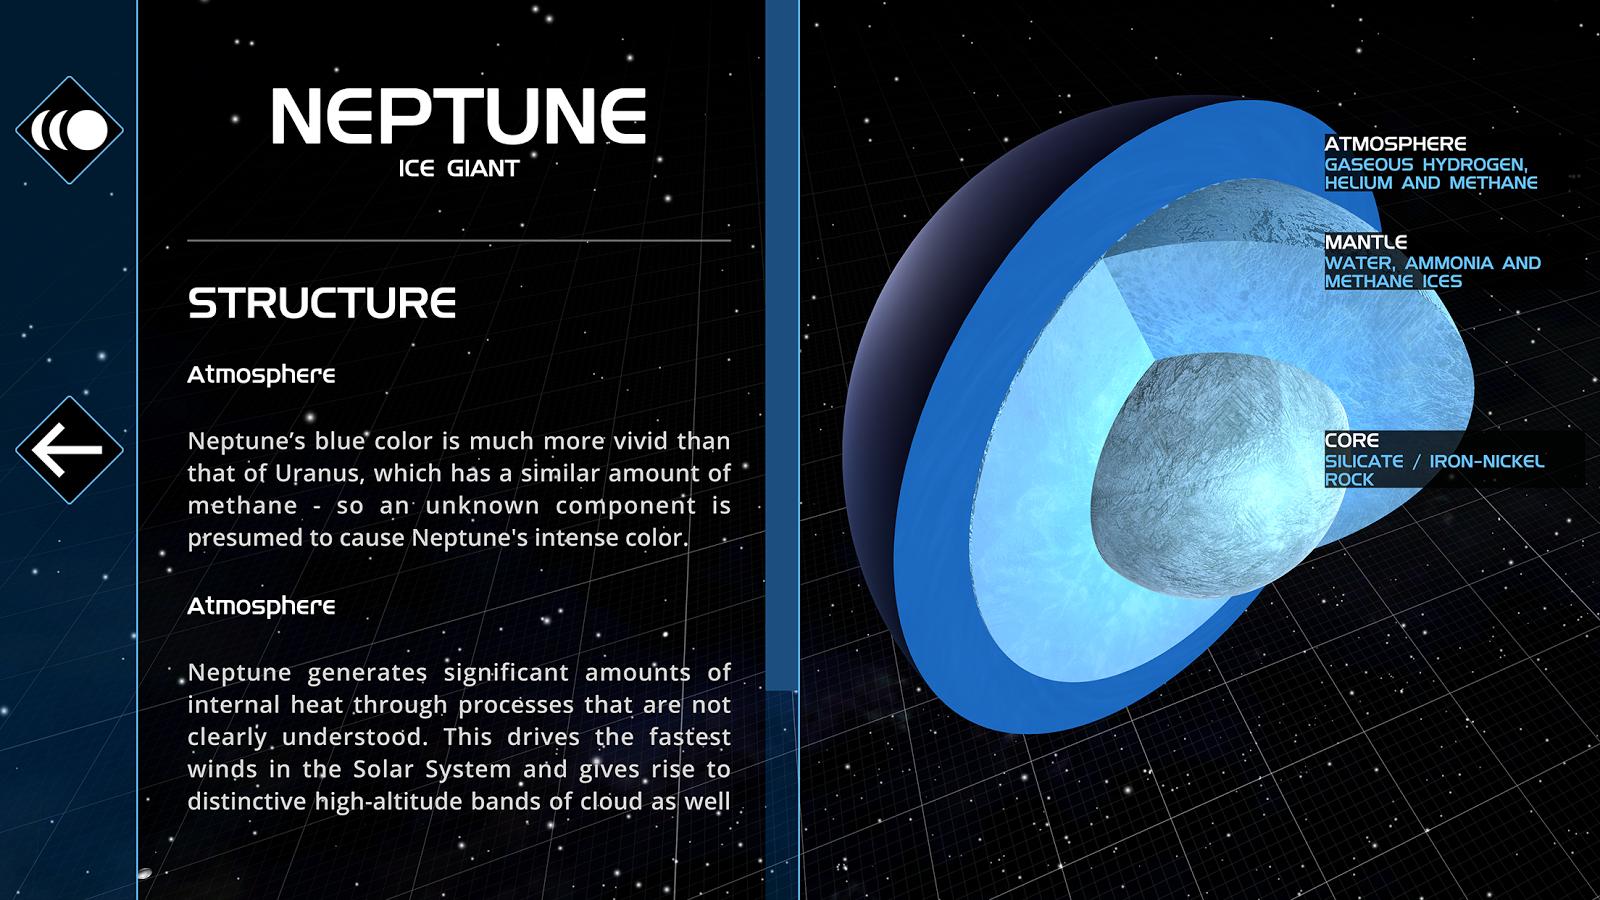 solar system scope pro full apk - photo #22